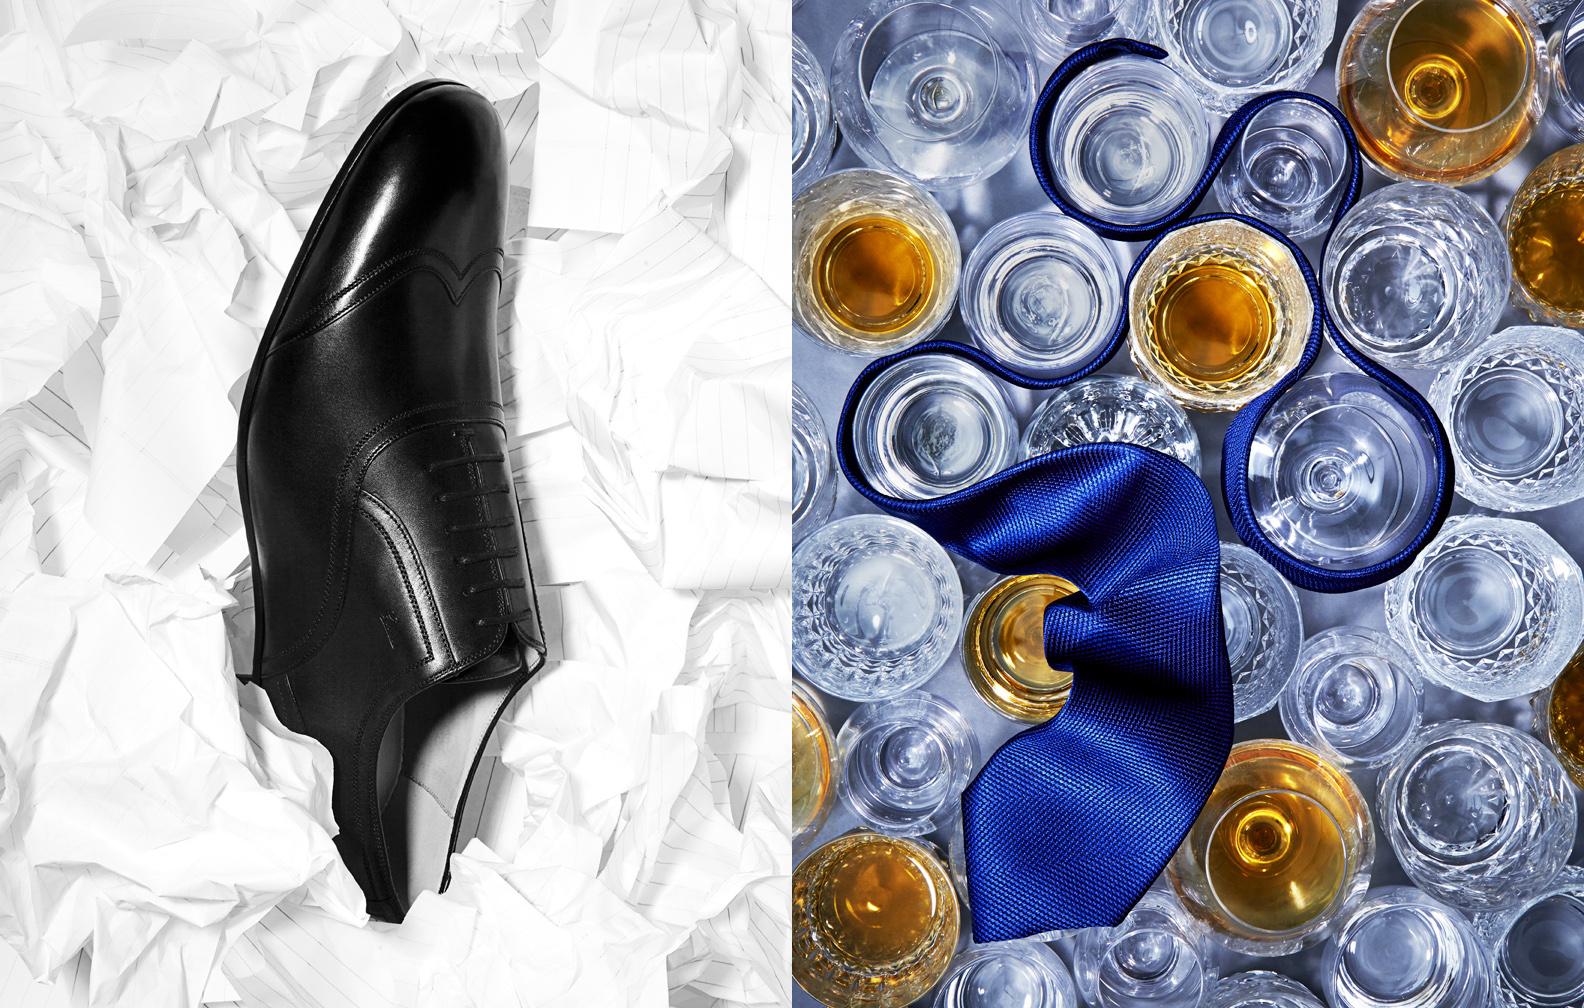 Prada Shoe & Gucci Tie Still Life